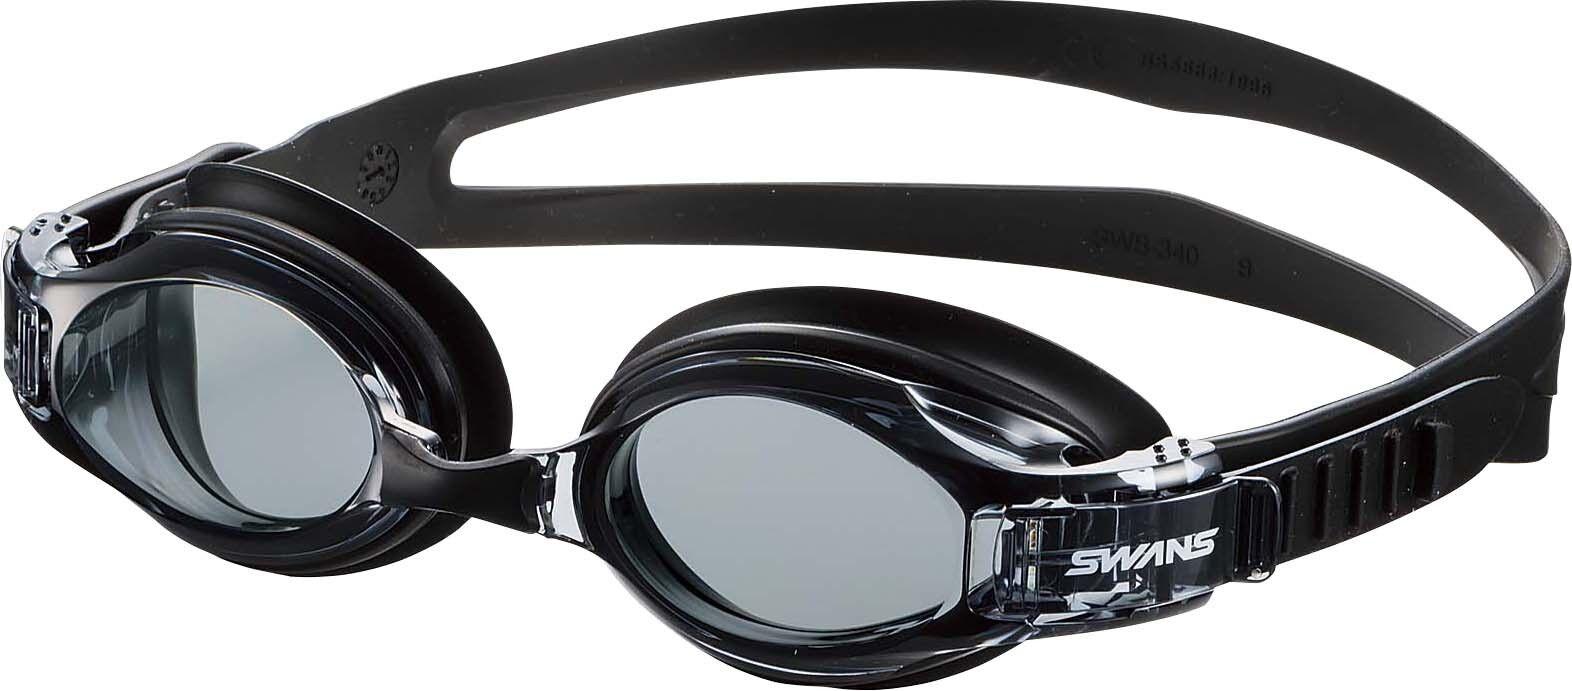 SWANS Japan Swimming Goggle Anti-fog UV cut fitness Easy adjuster SW-34 SMBK